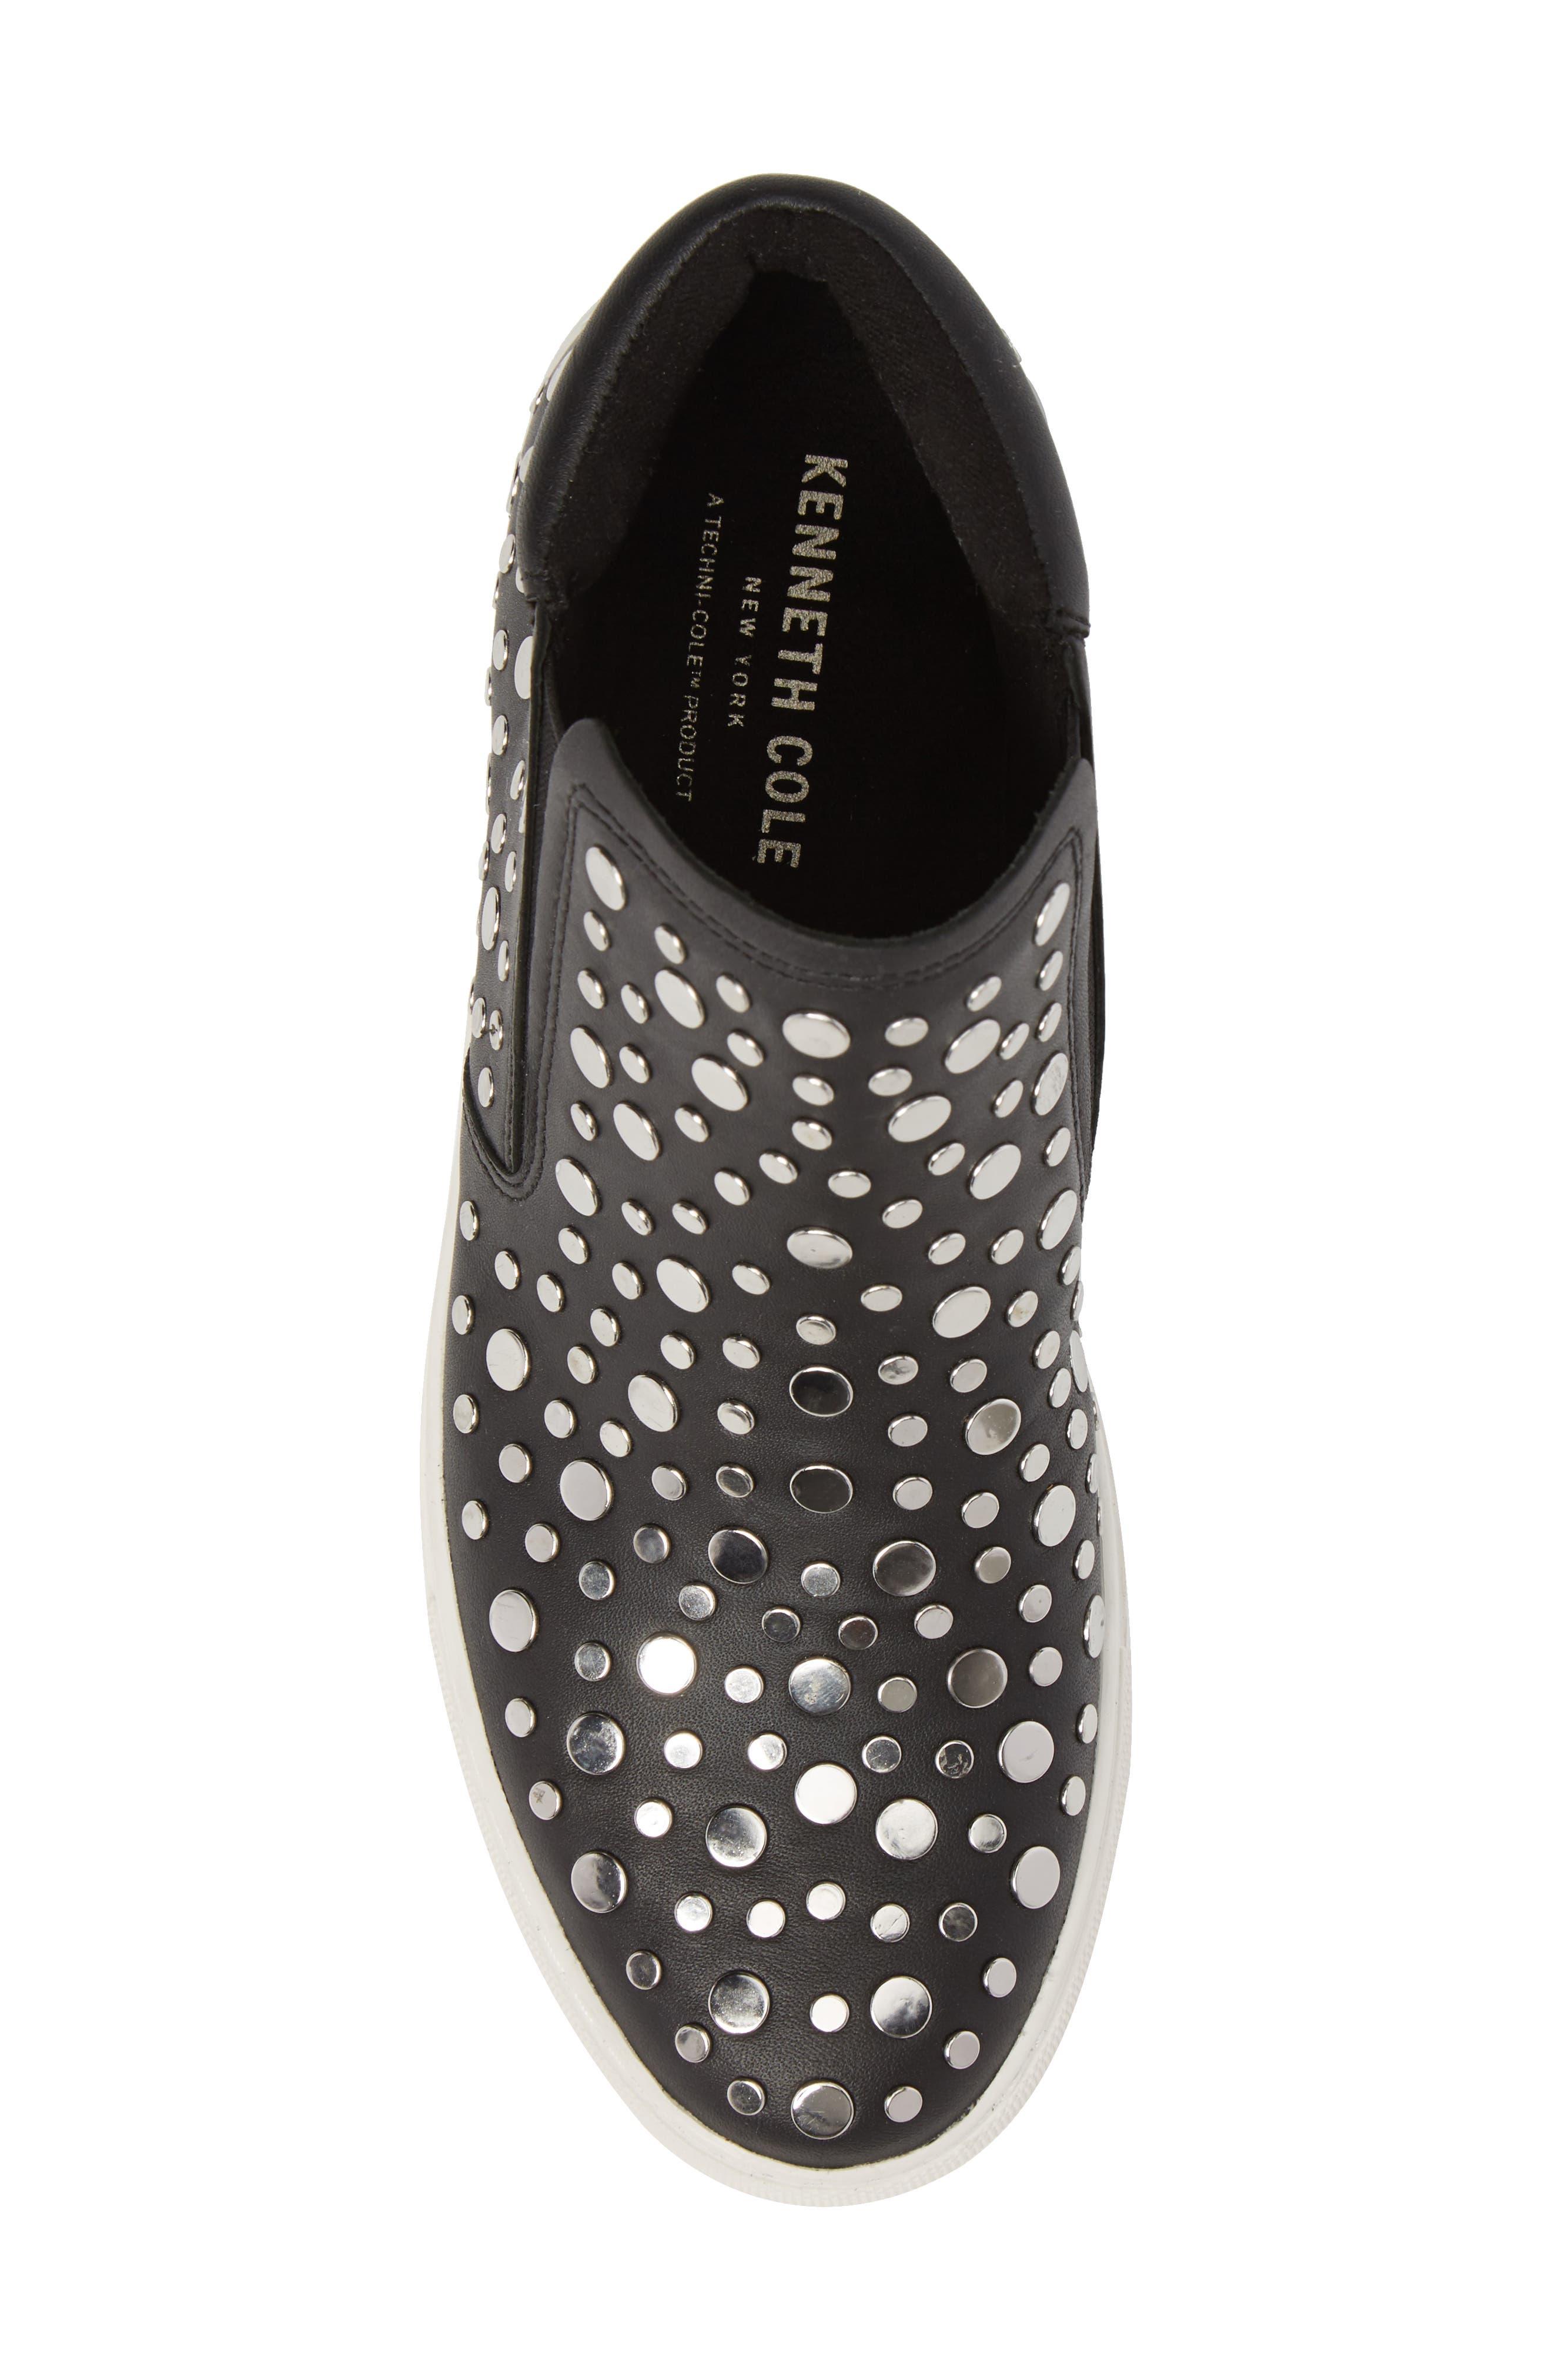 Kalvin Studded High Top Sneaker,                             Alternate thumbnail 5, color,                             Black Leather